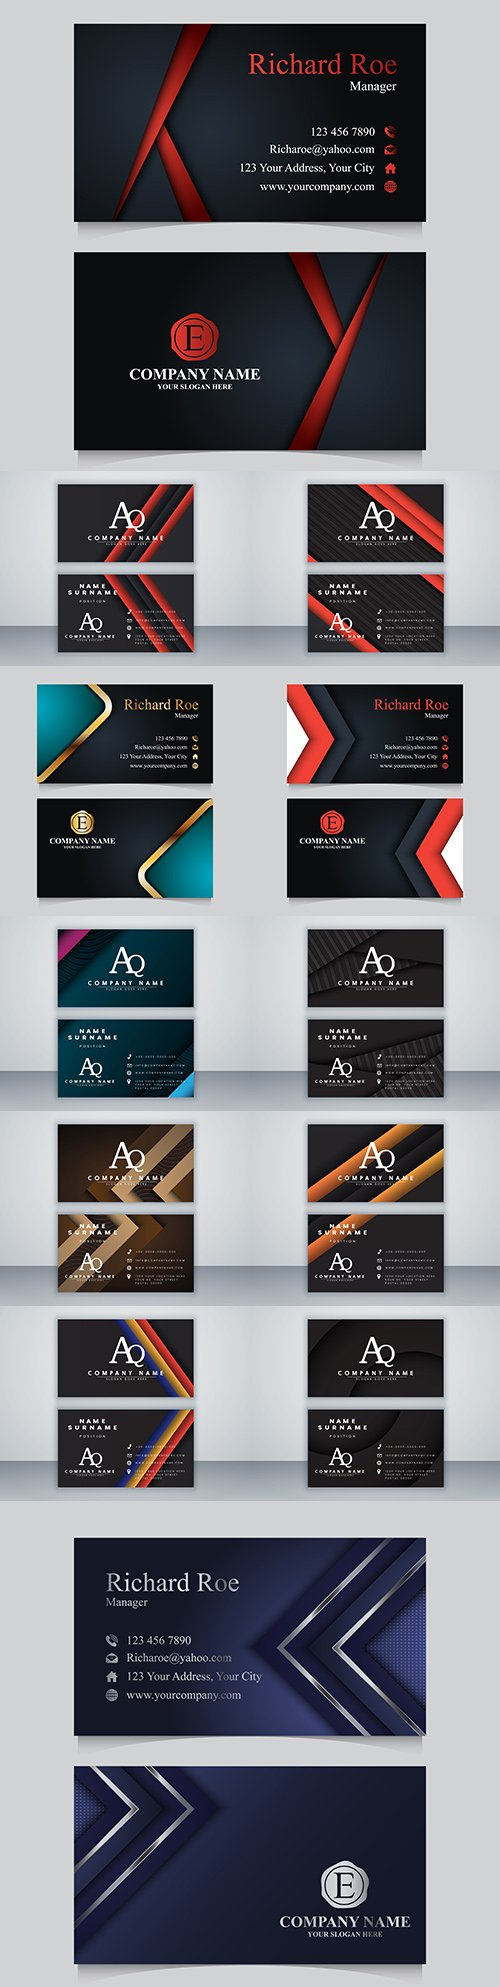 Business card template design on dark background 2